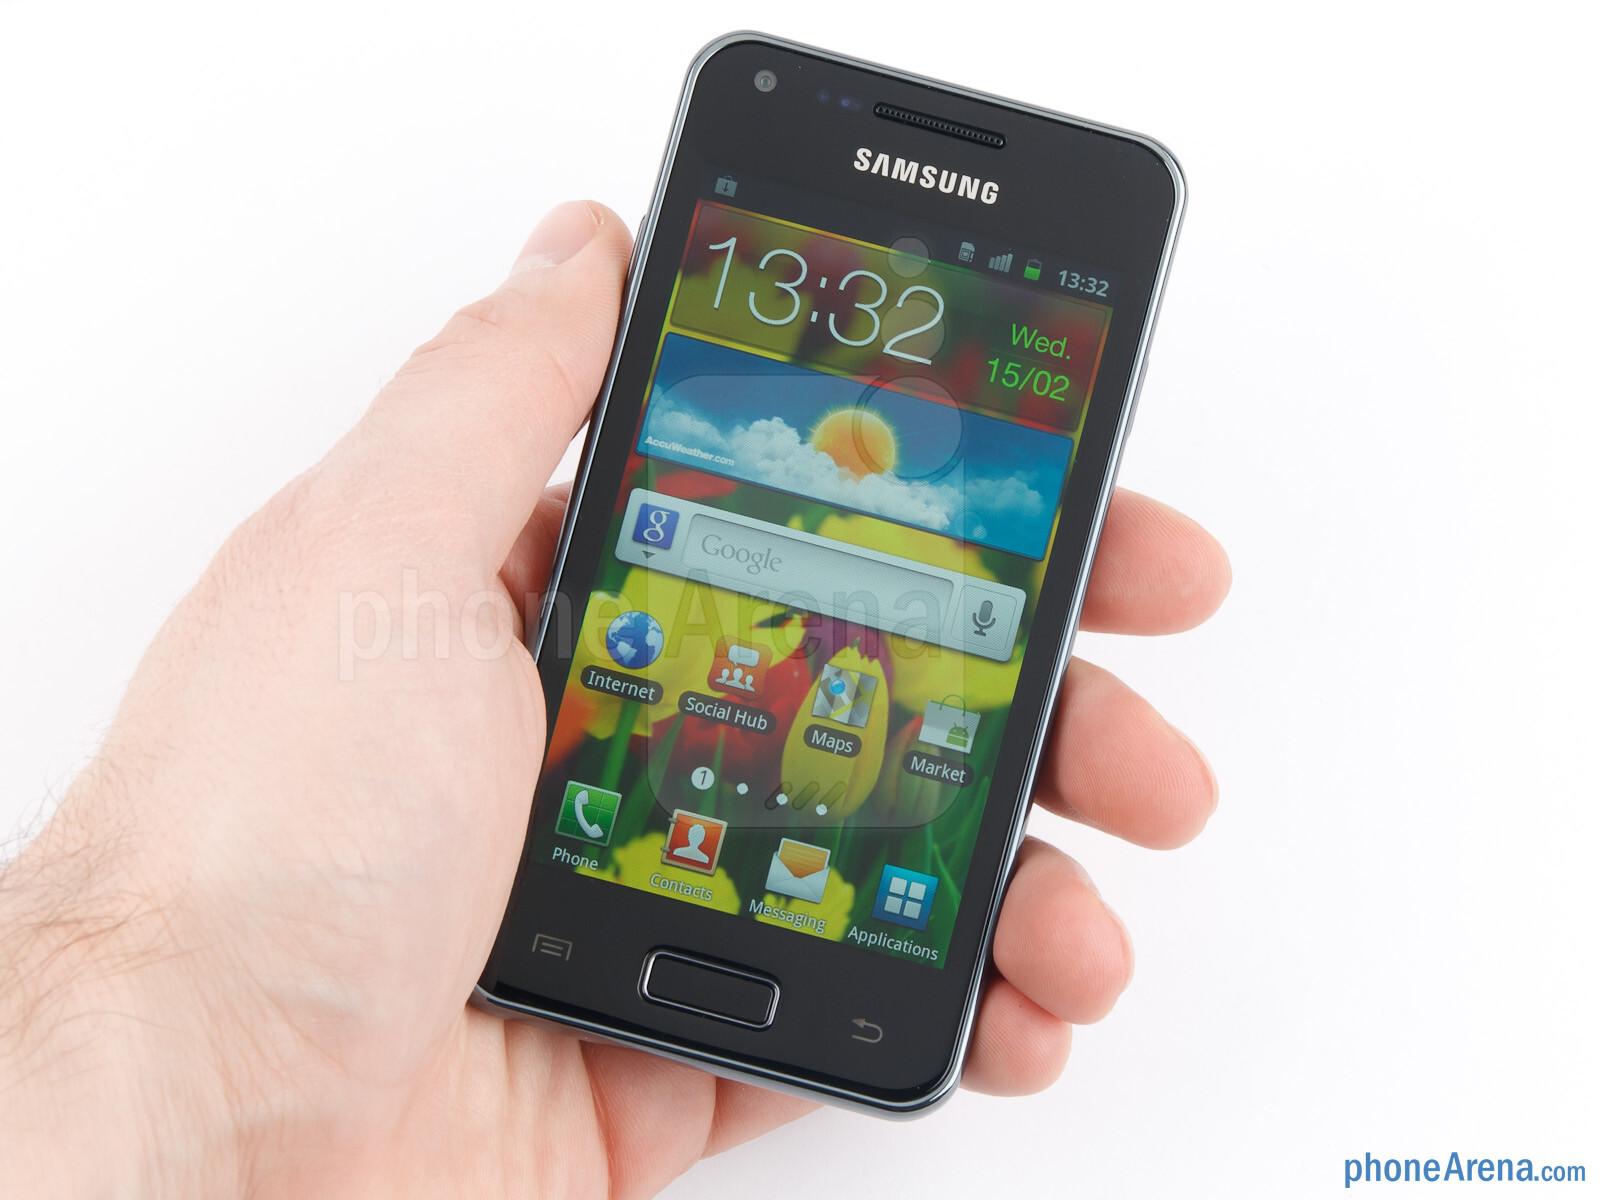 Samsung Galaxy S Advance Review - PhoneArena